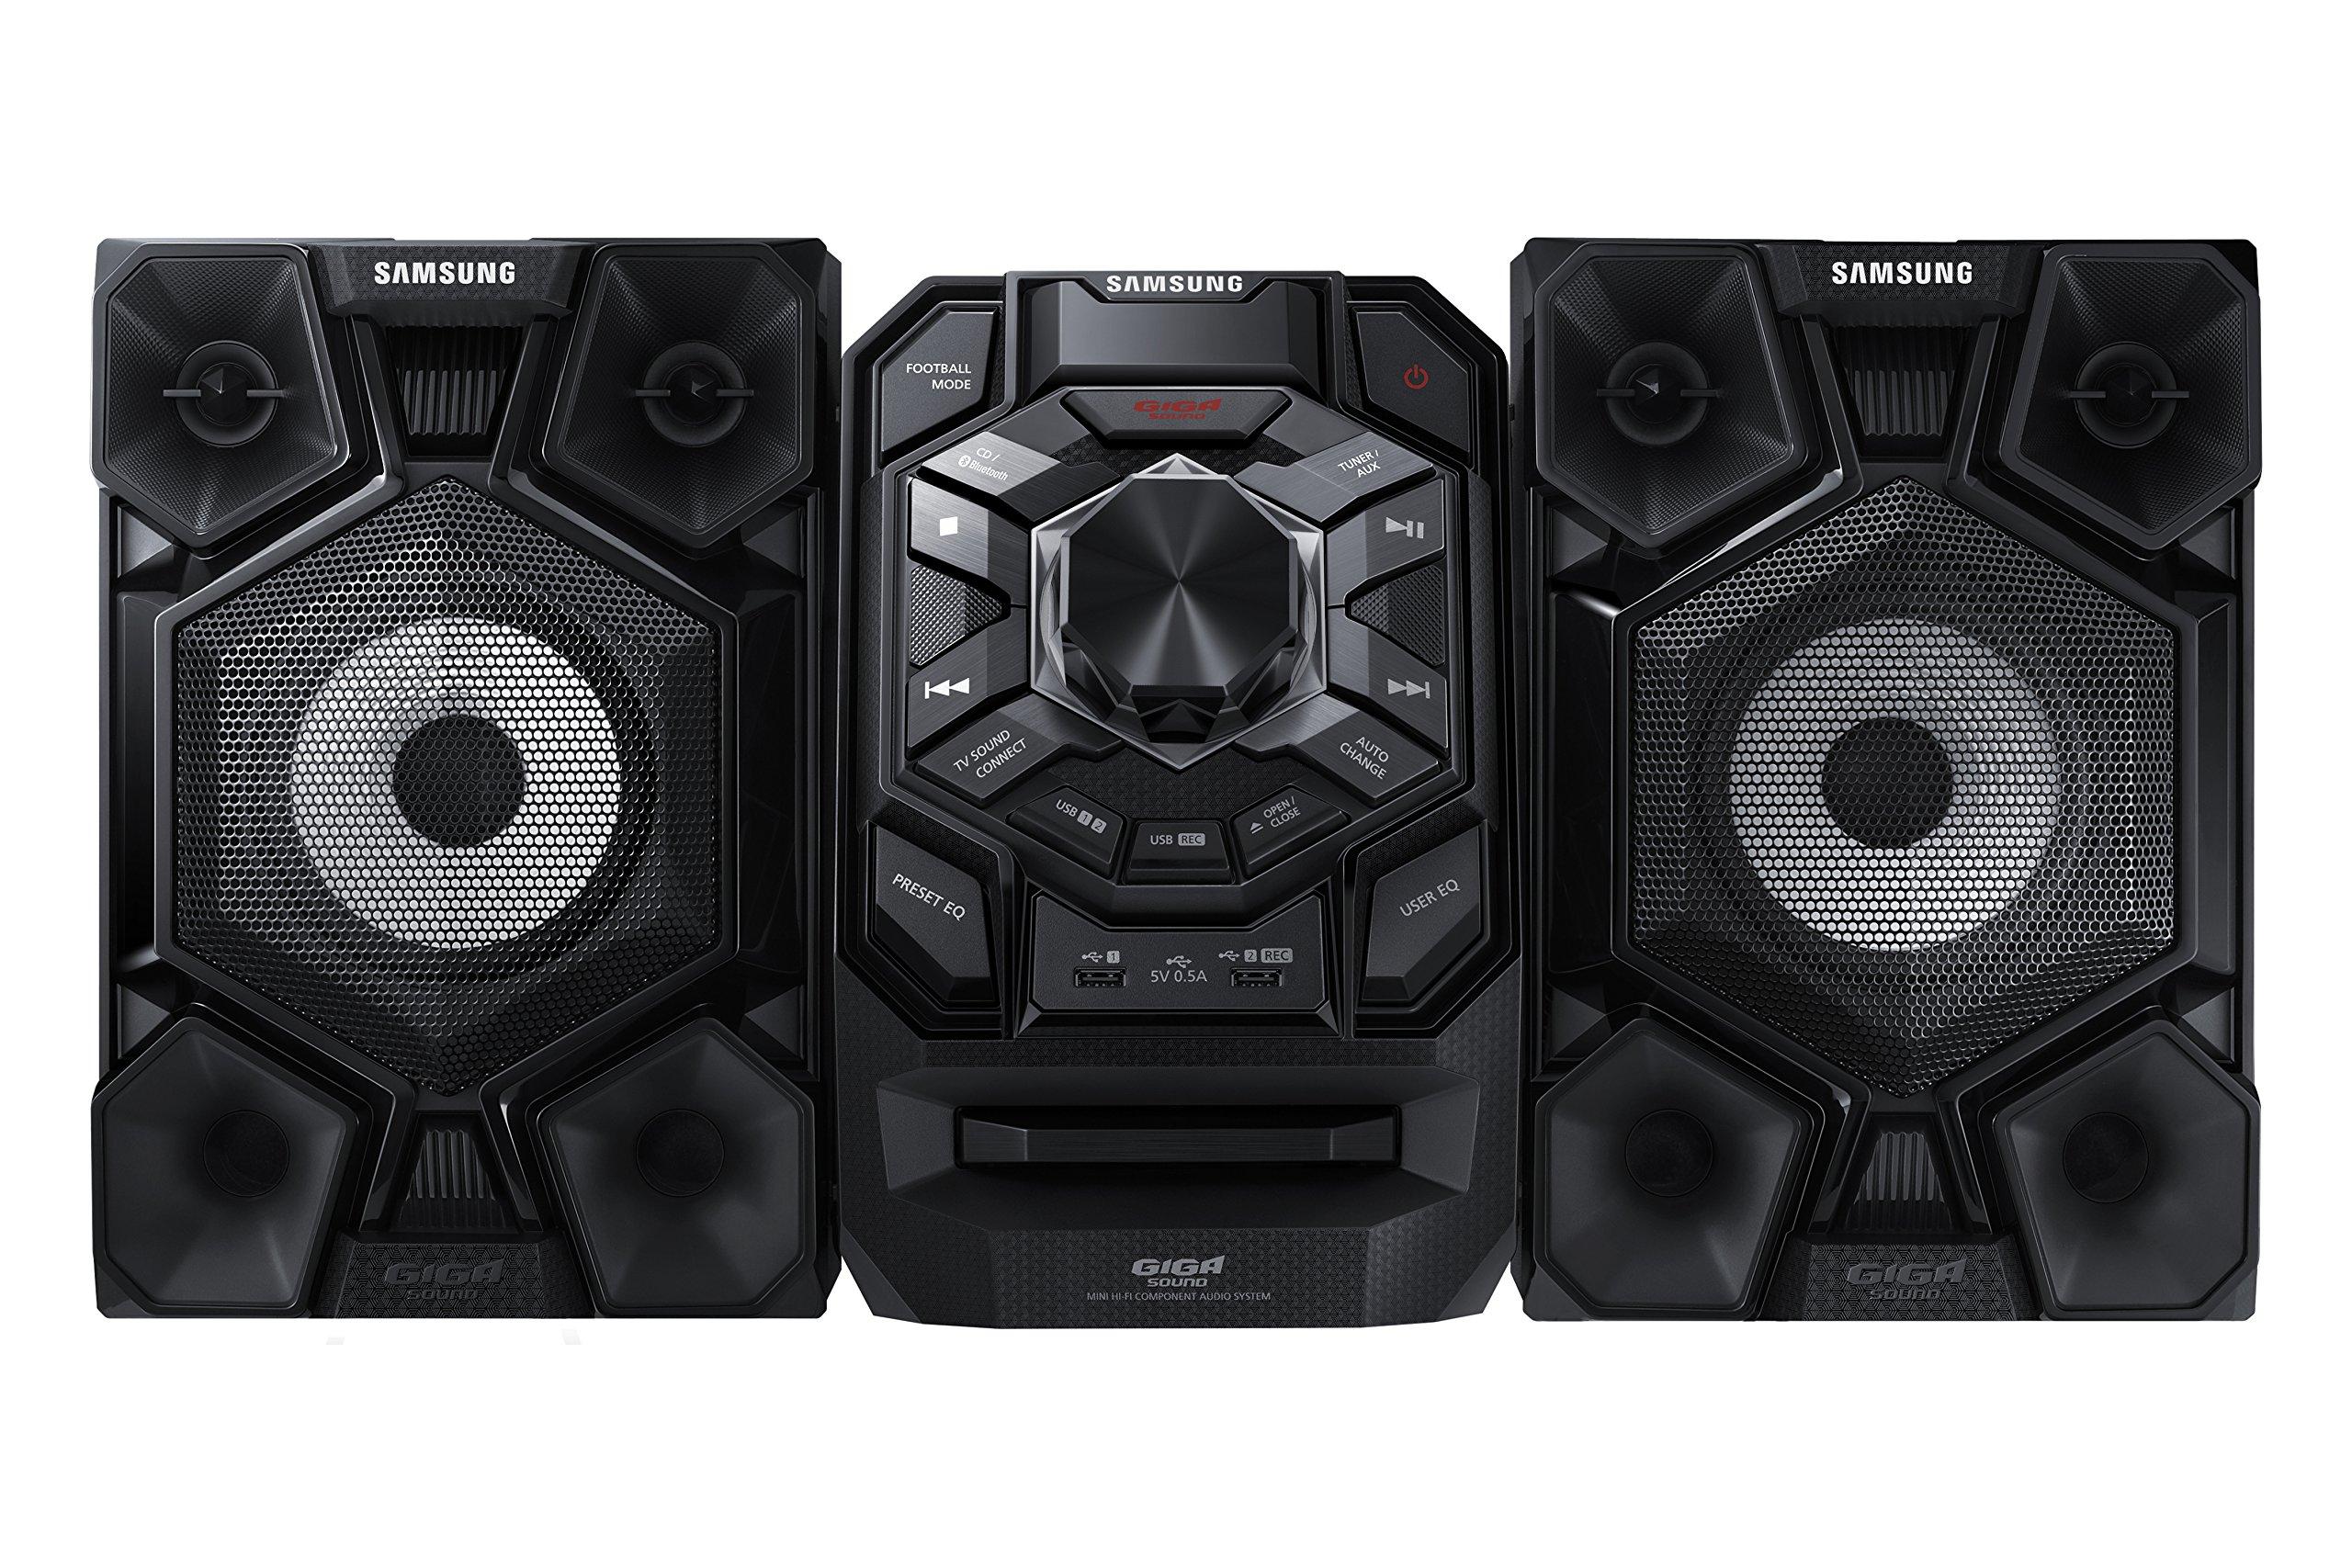 Samsung MX-J630 2.0 Channel 230 Watt Wired Audio Giga System (2015 Model)